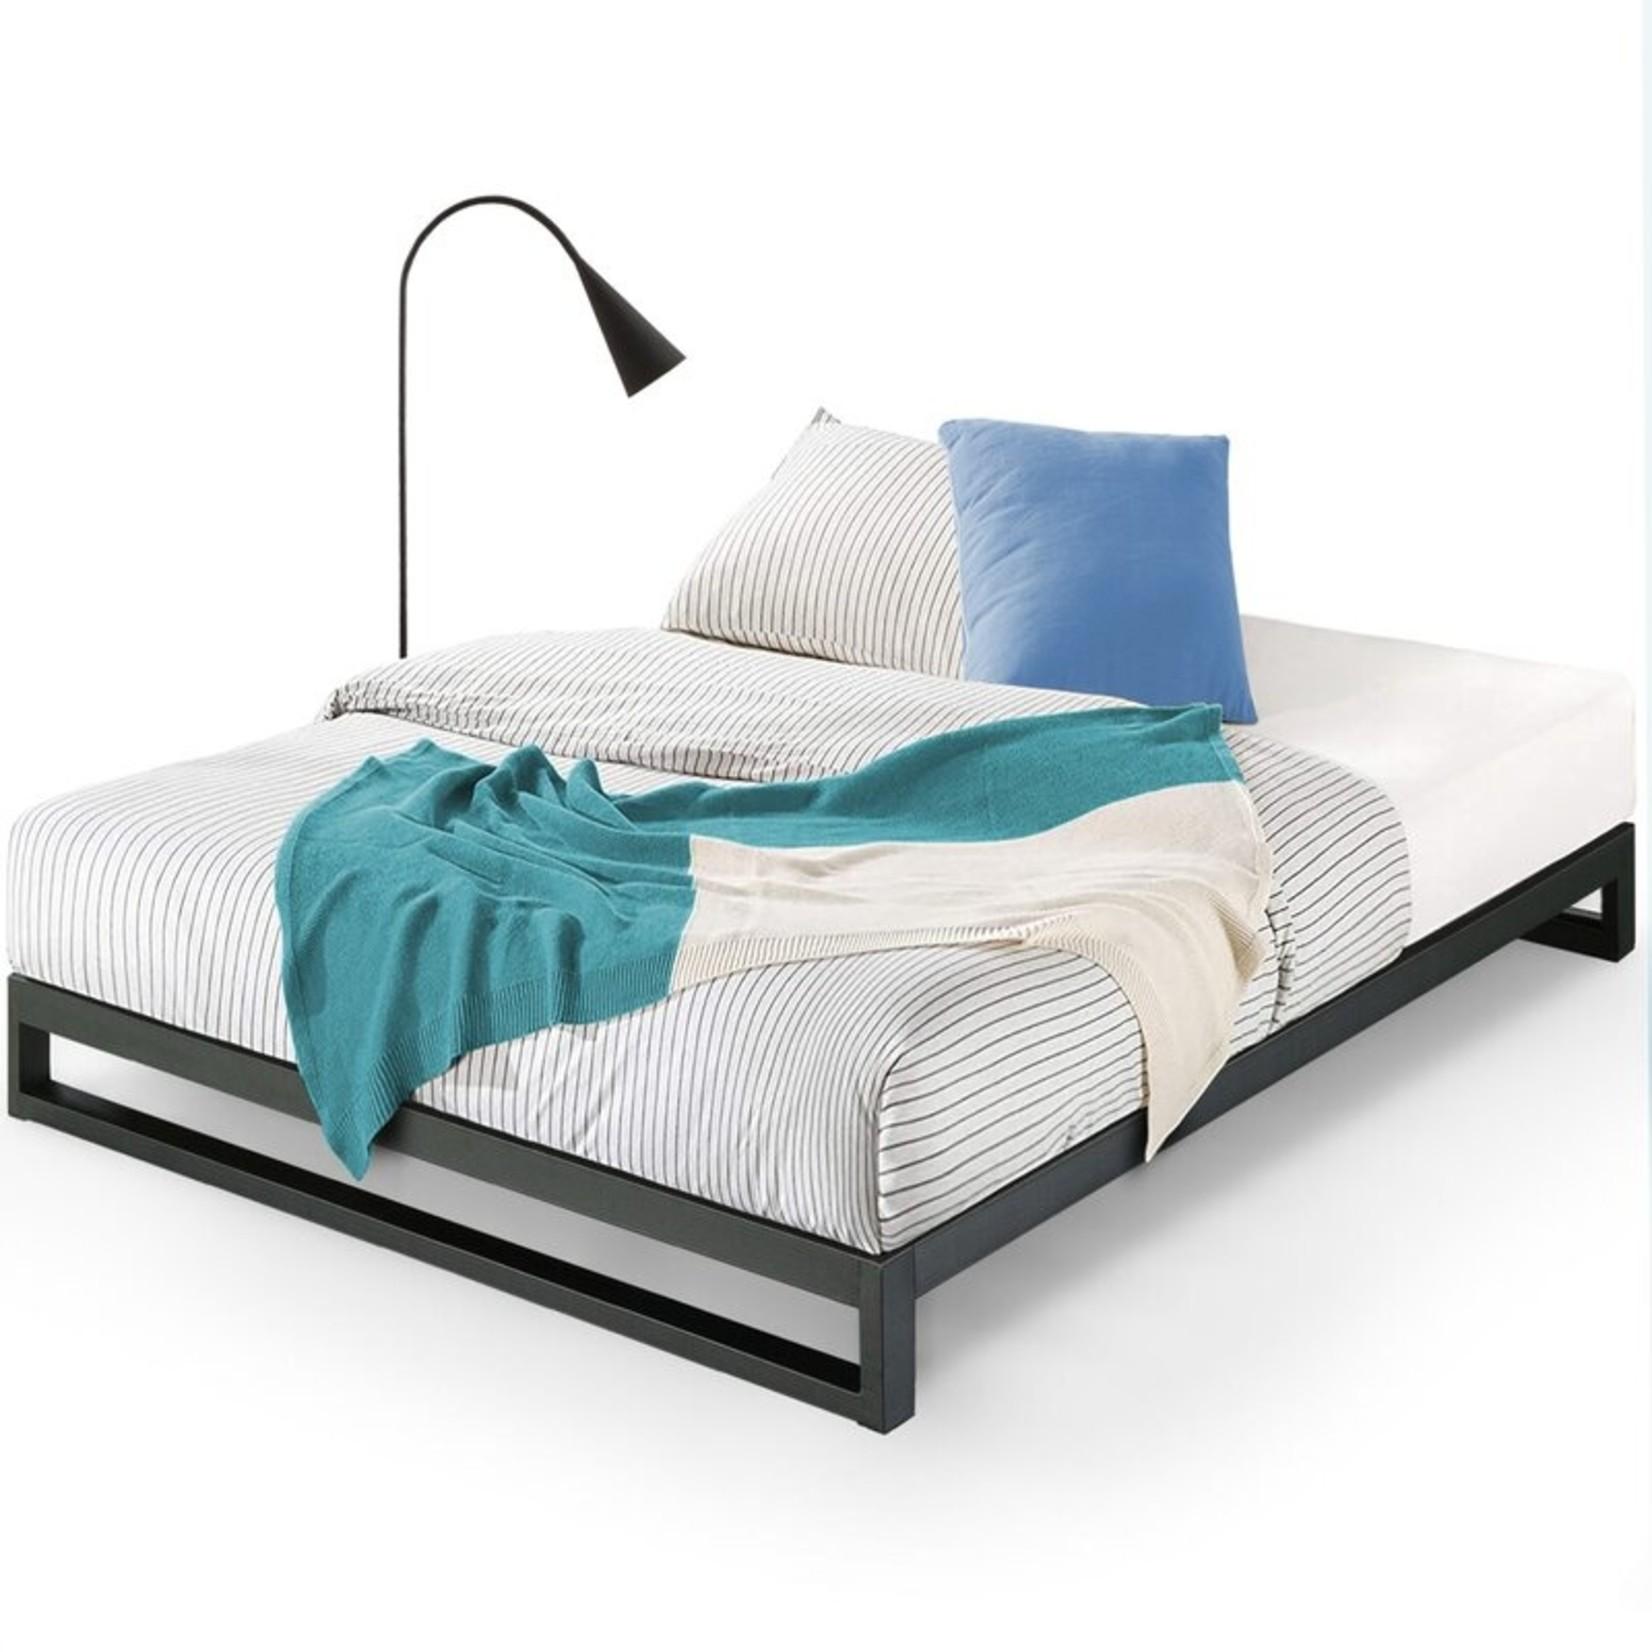 *Full - Hanley Heavy Duty Bed Frame